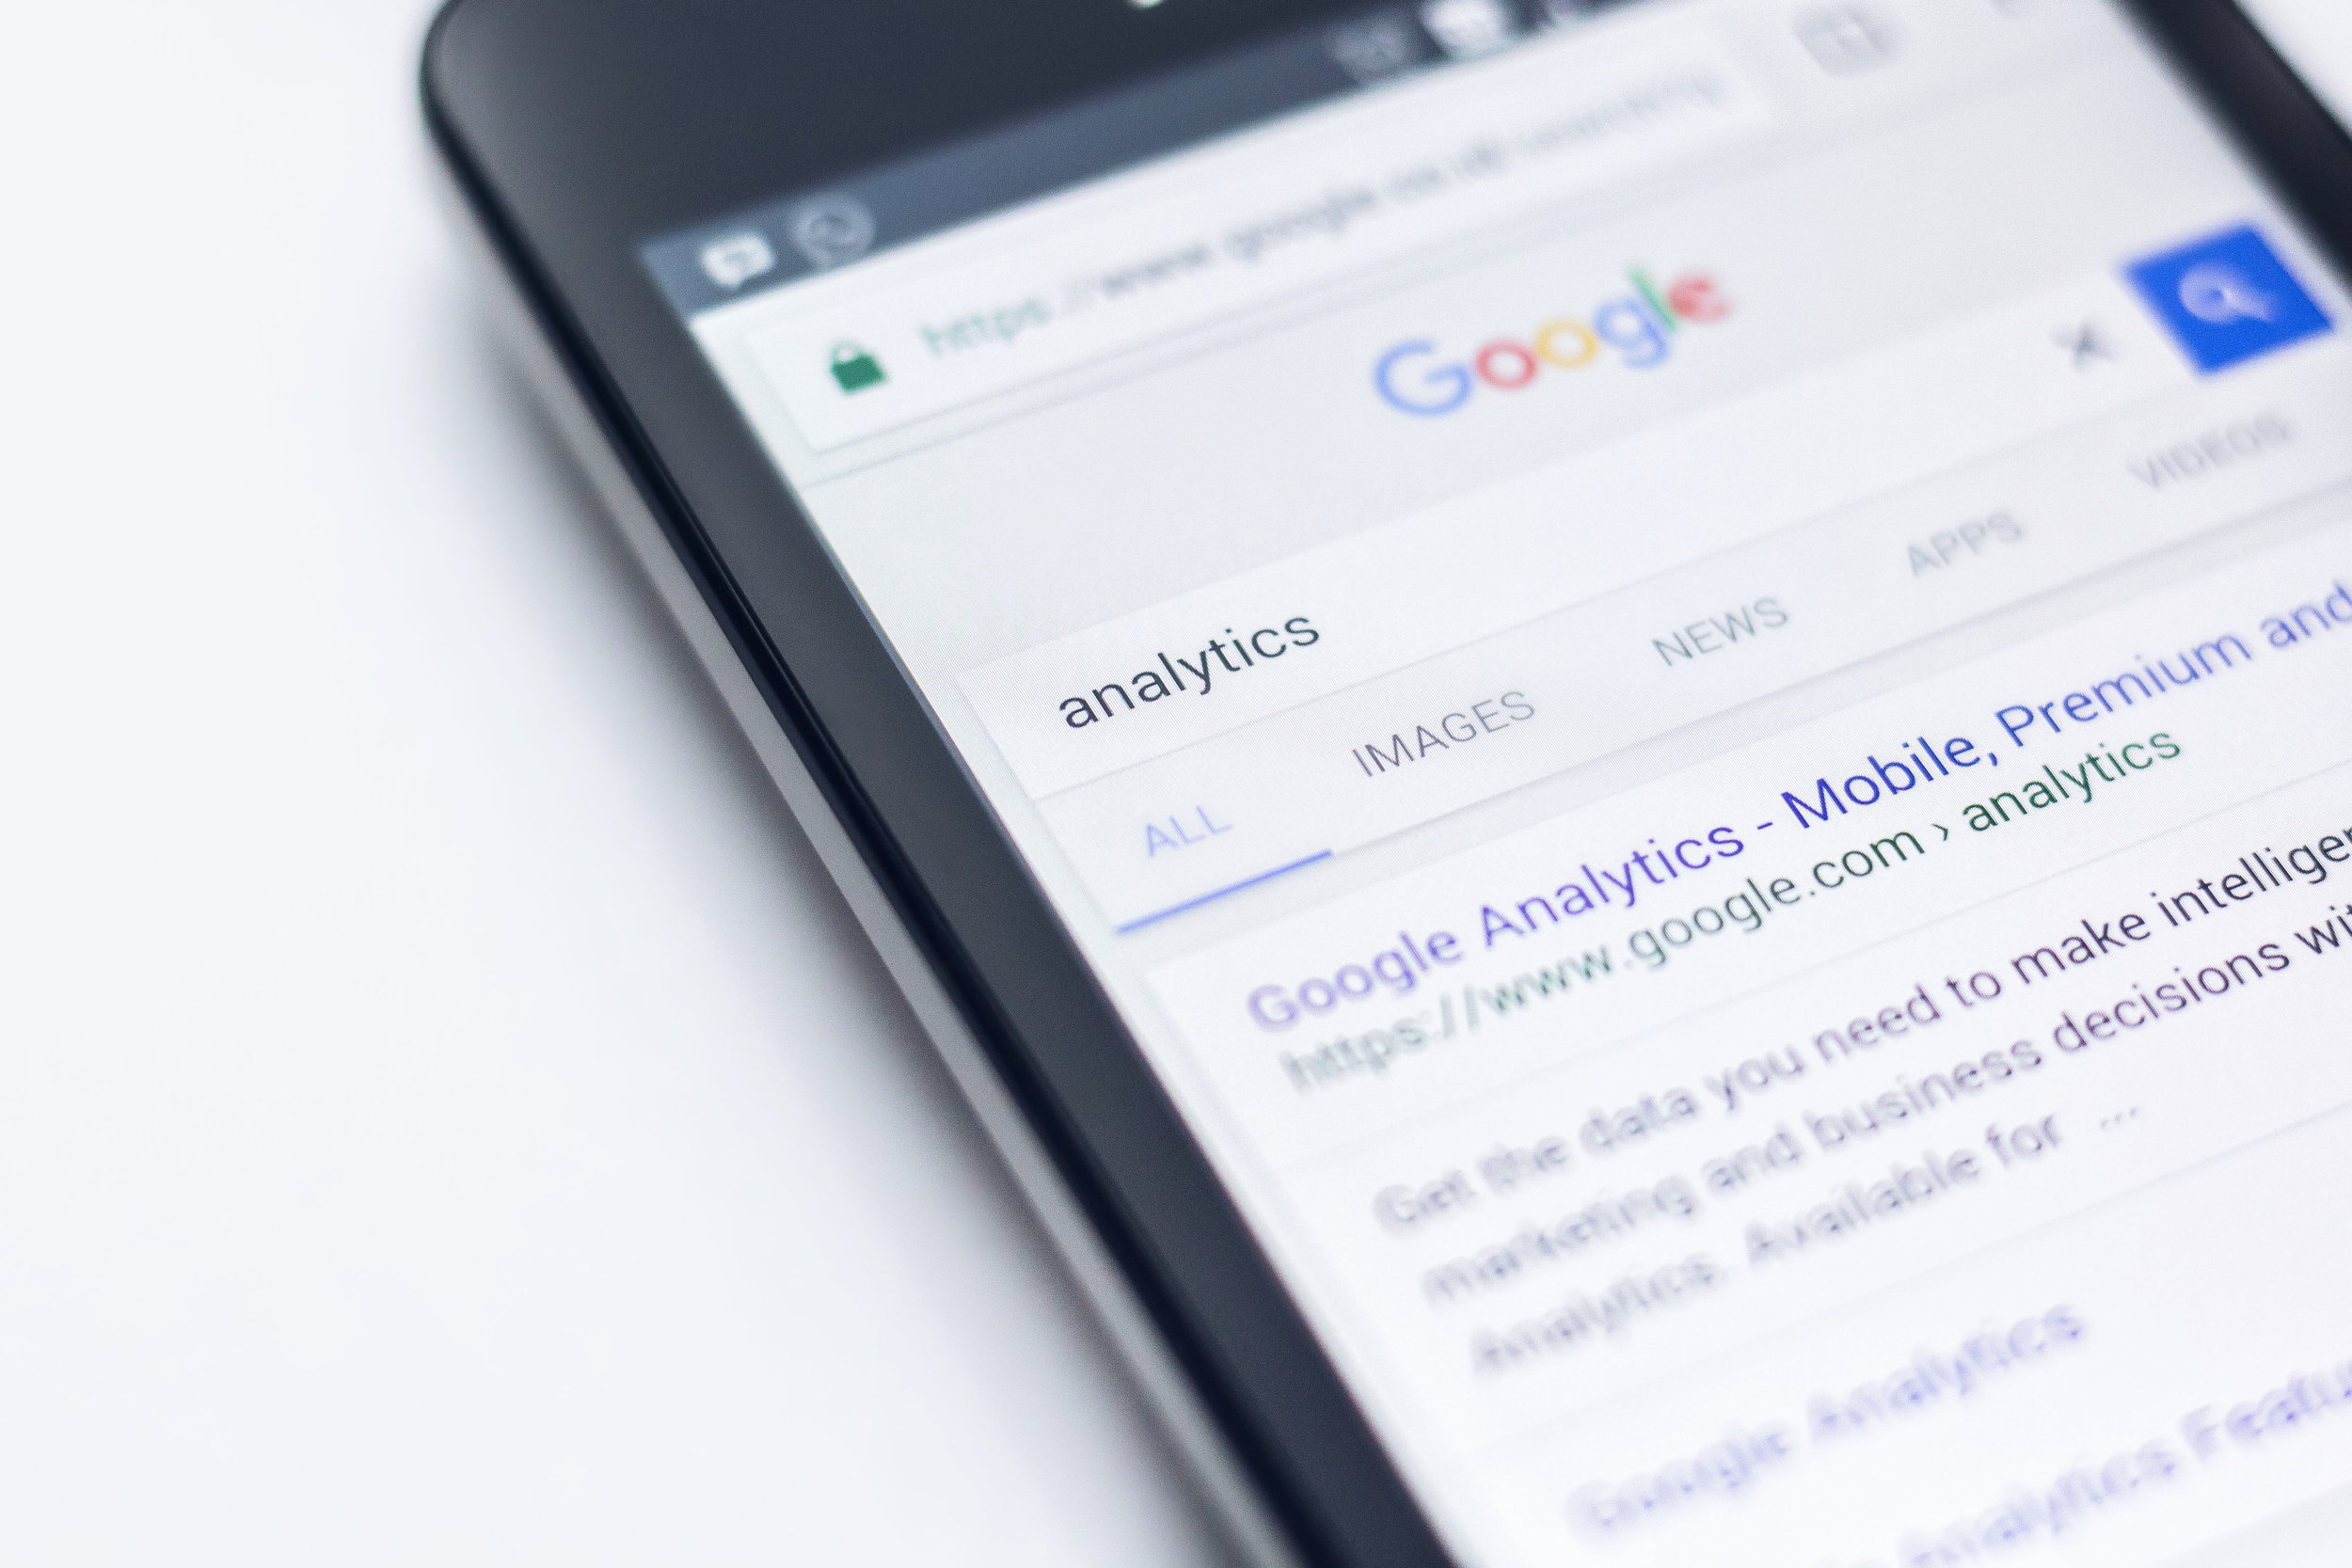 search-engine-optimisation-service-company-worcester-web-designers